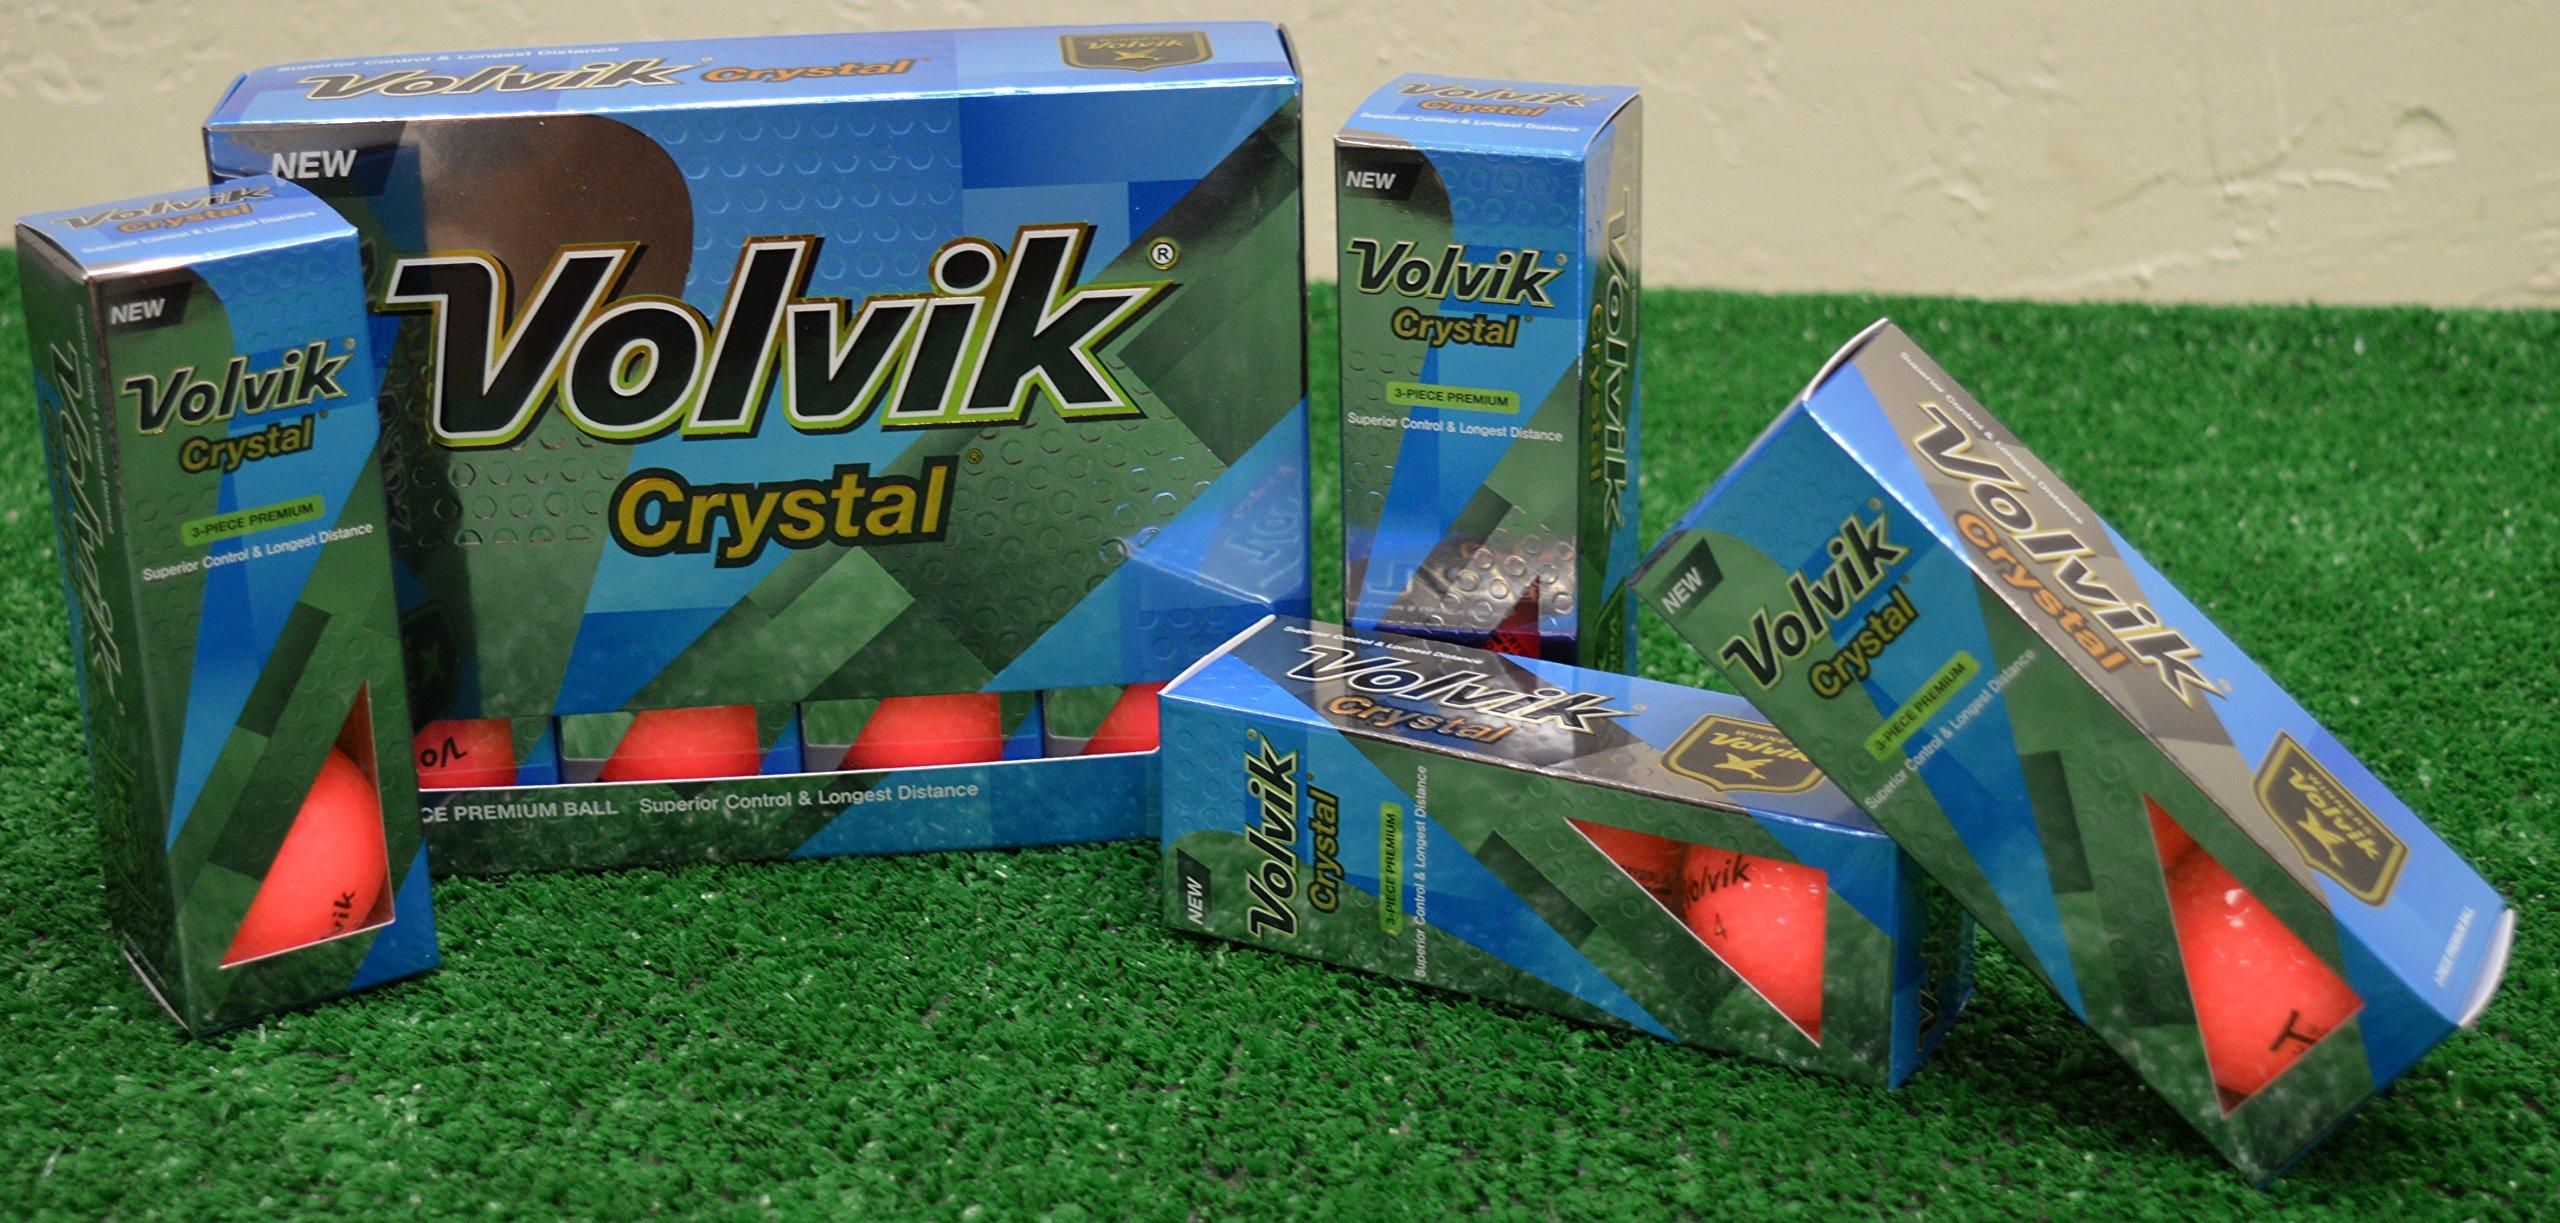 3 Dozen 2016 Volvik Crystal Pink Golf Balls - New in Box